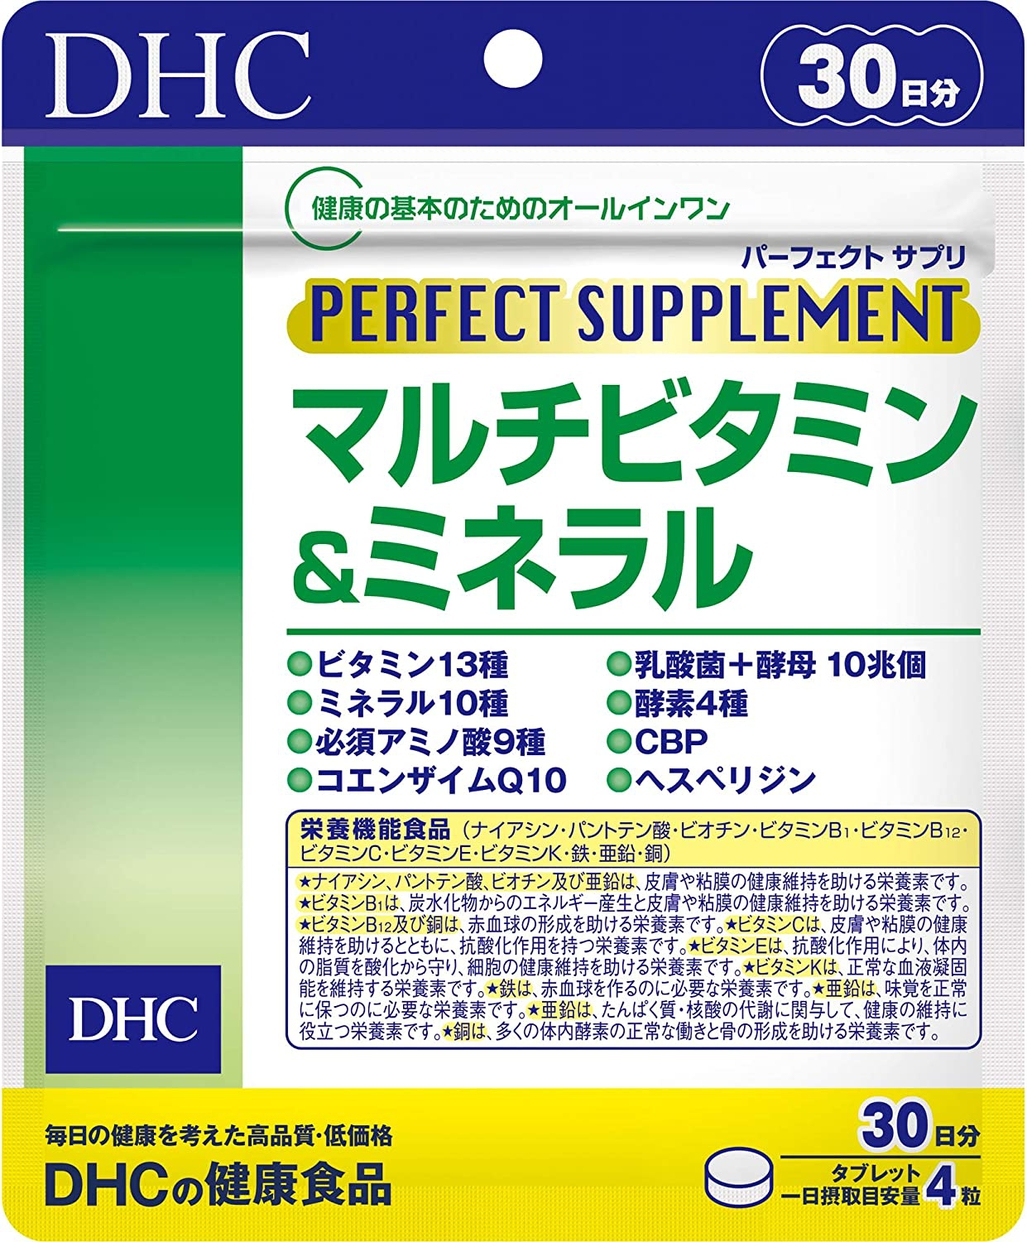 DHC(ディーエイチシー)パーフェクトサプリ マルチビタミン&ミネラル